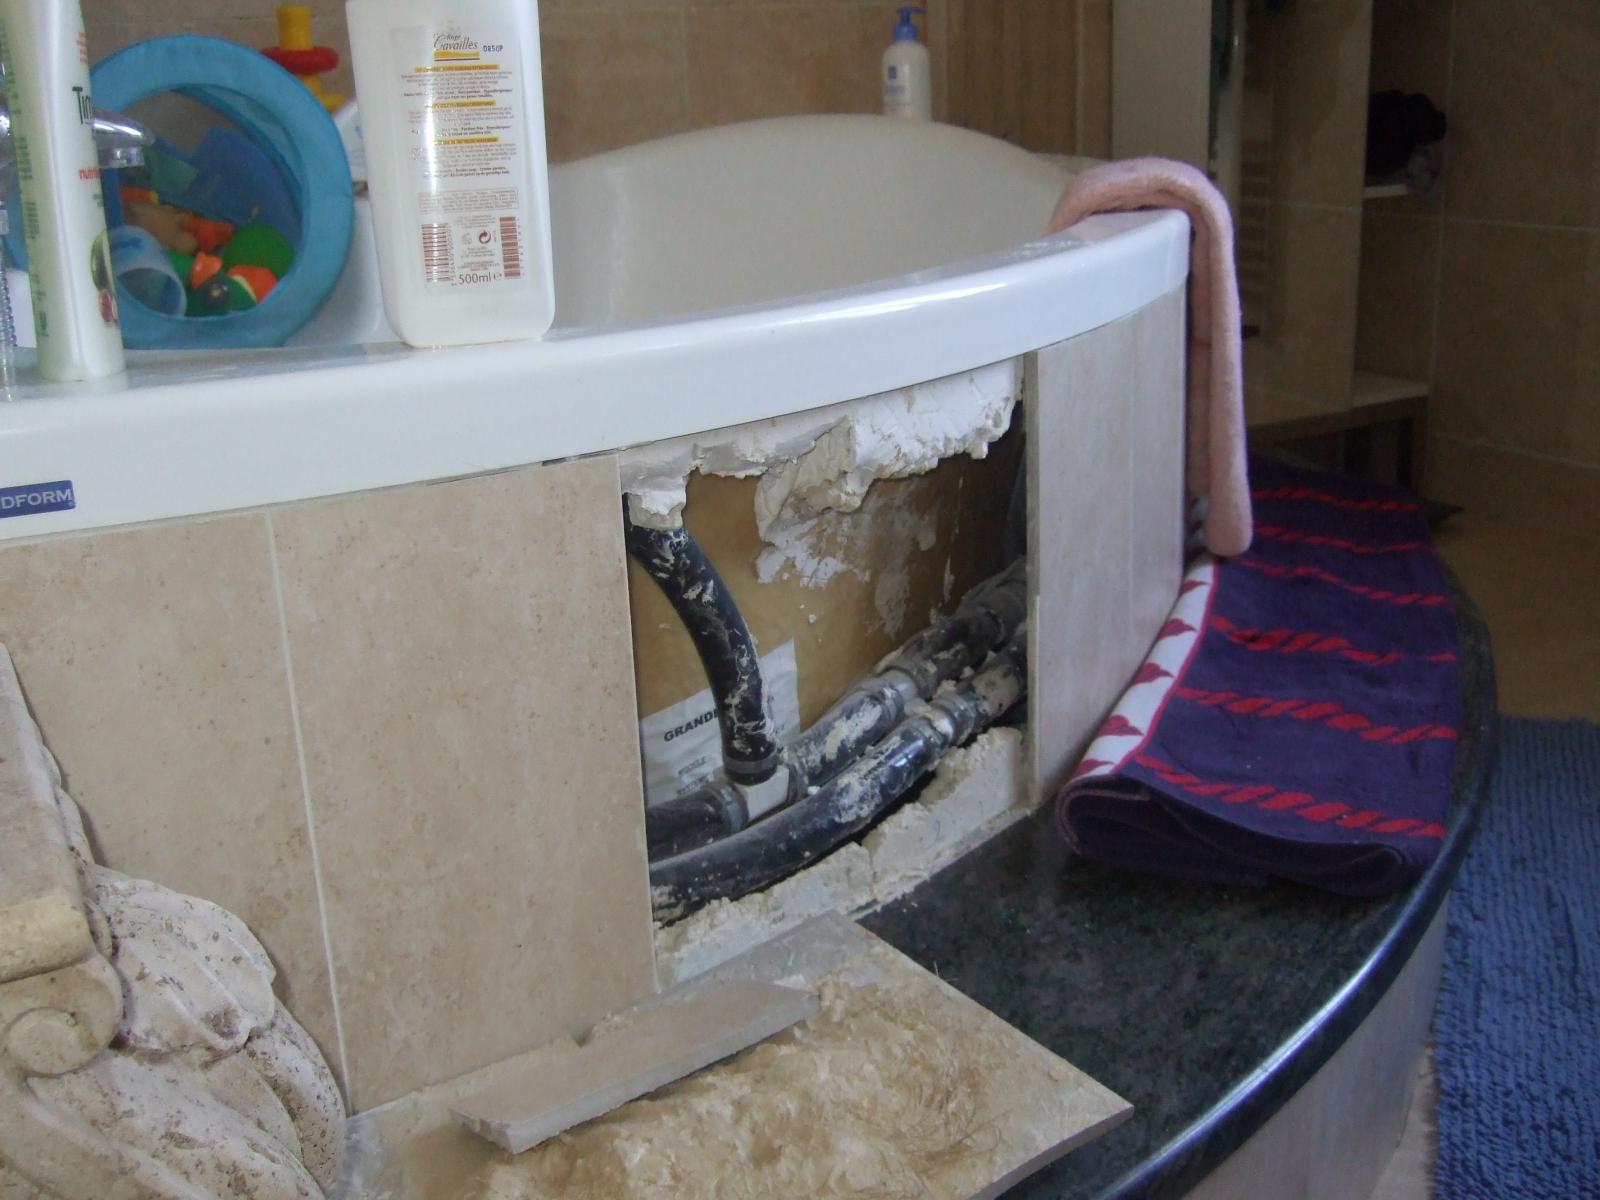 carelage de baignoire d 39 angle baln o. Black Bedroom Furniture Sets. Home Design Ideas